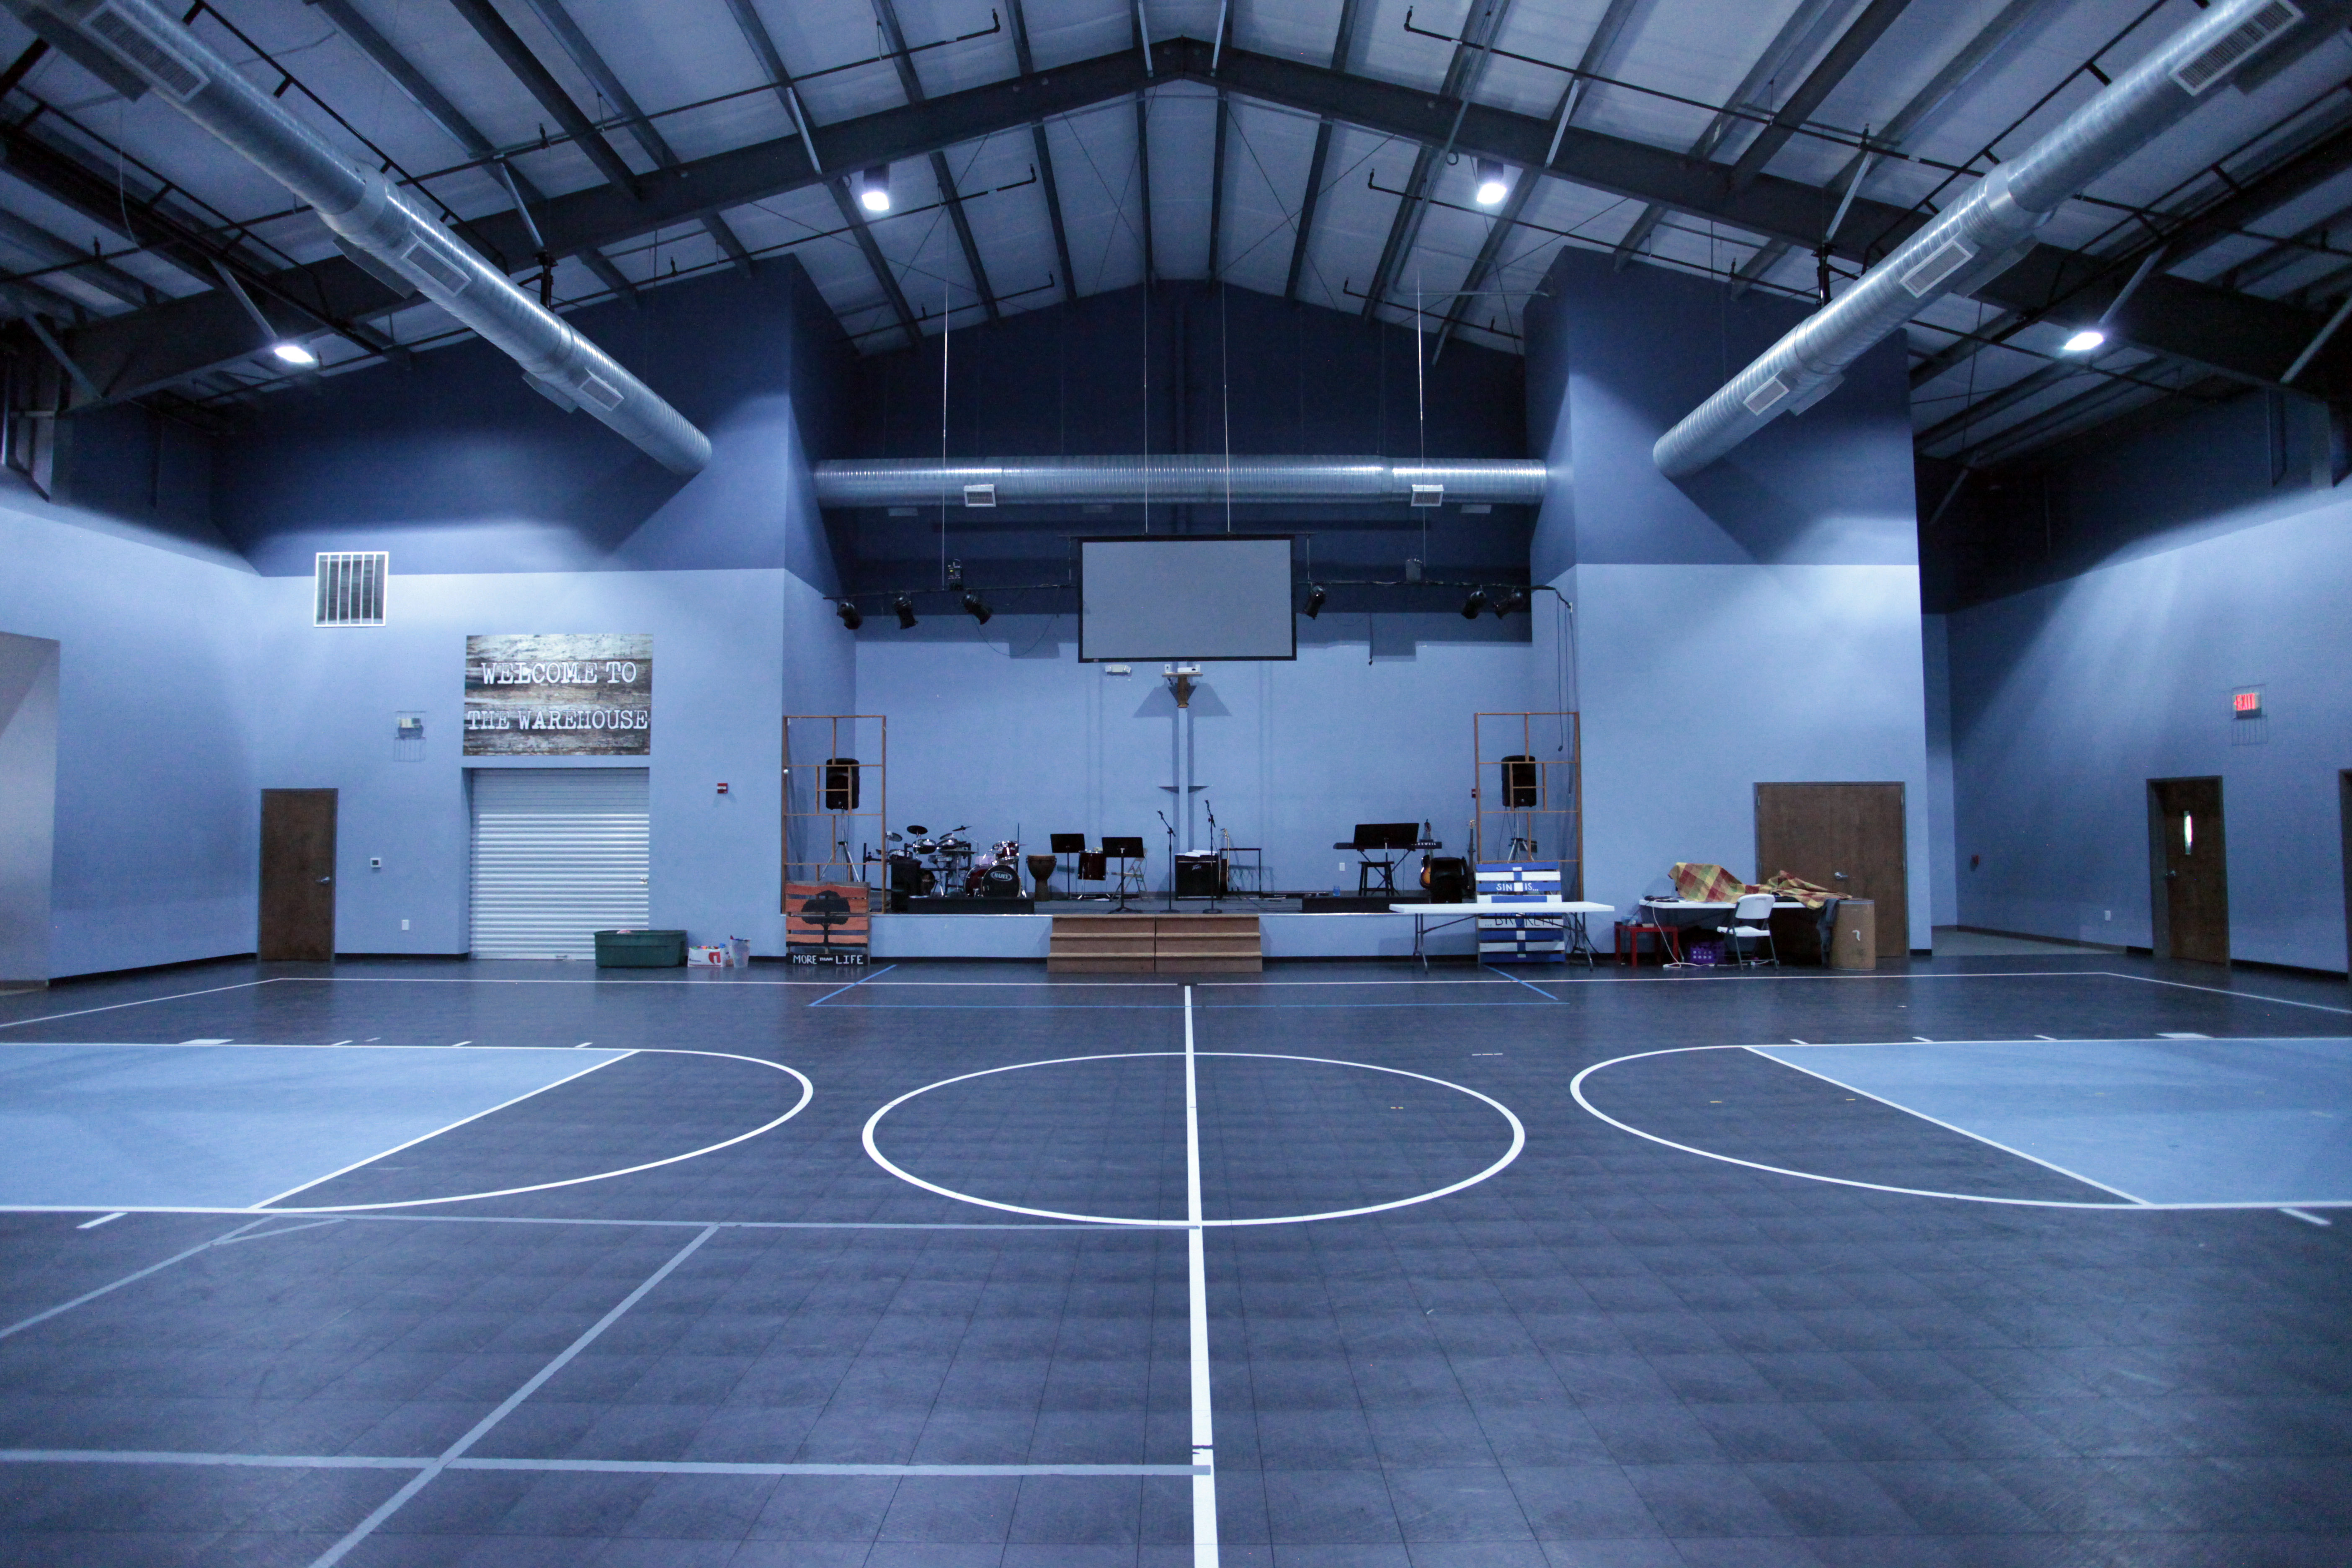 Gymnasium Stage